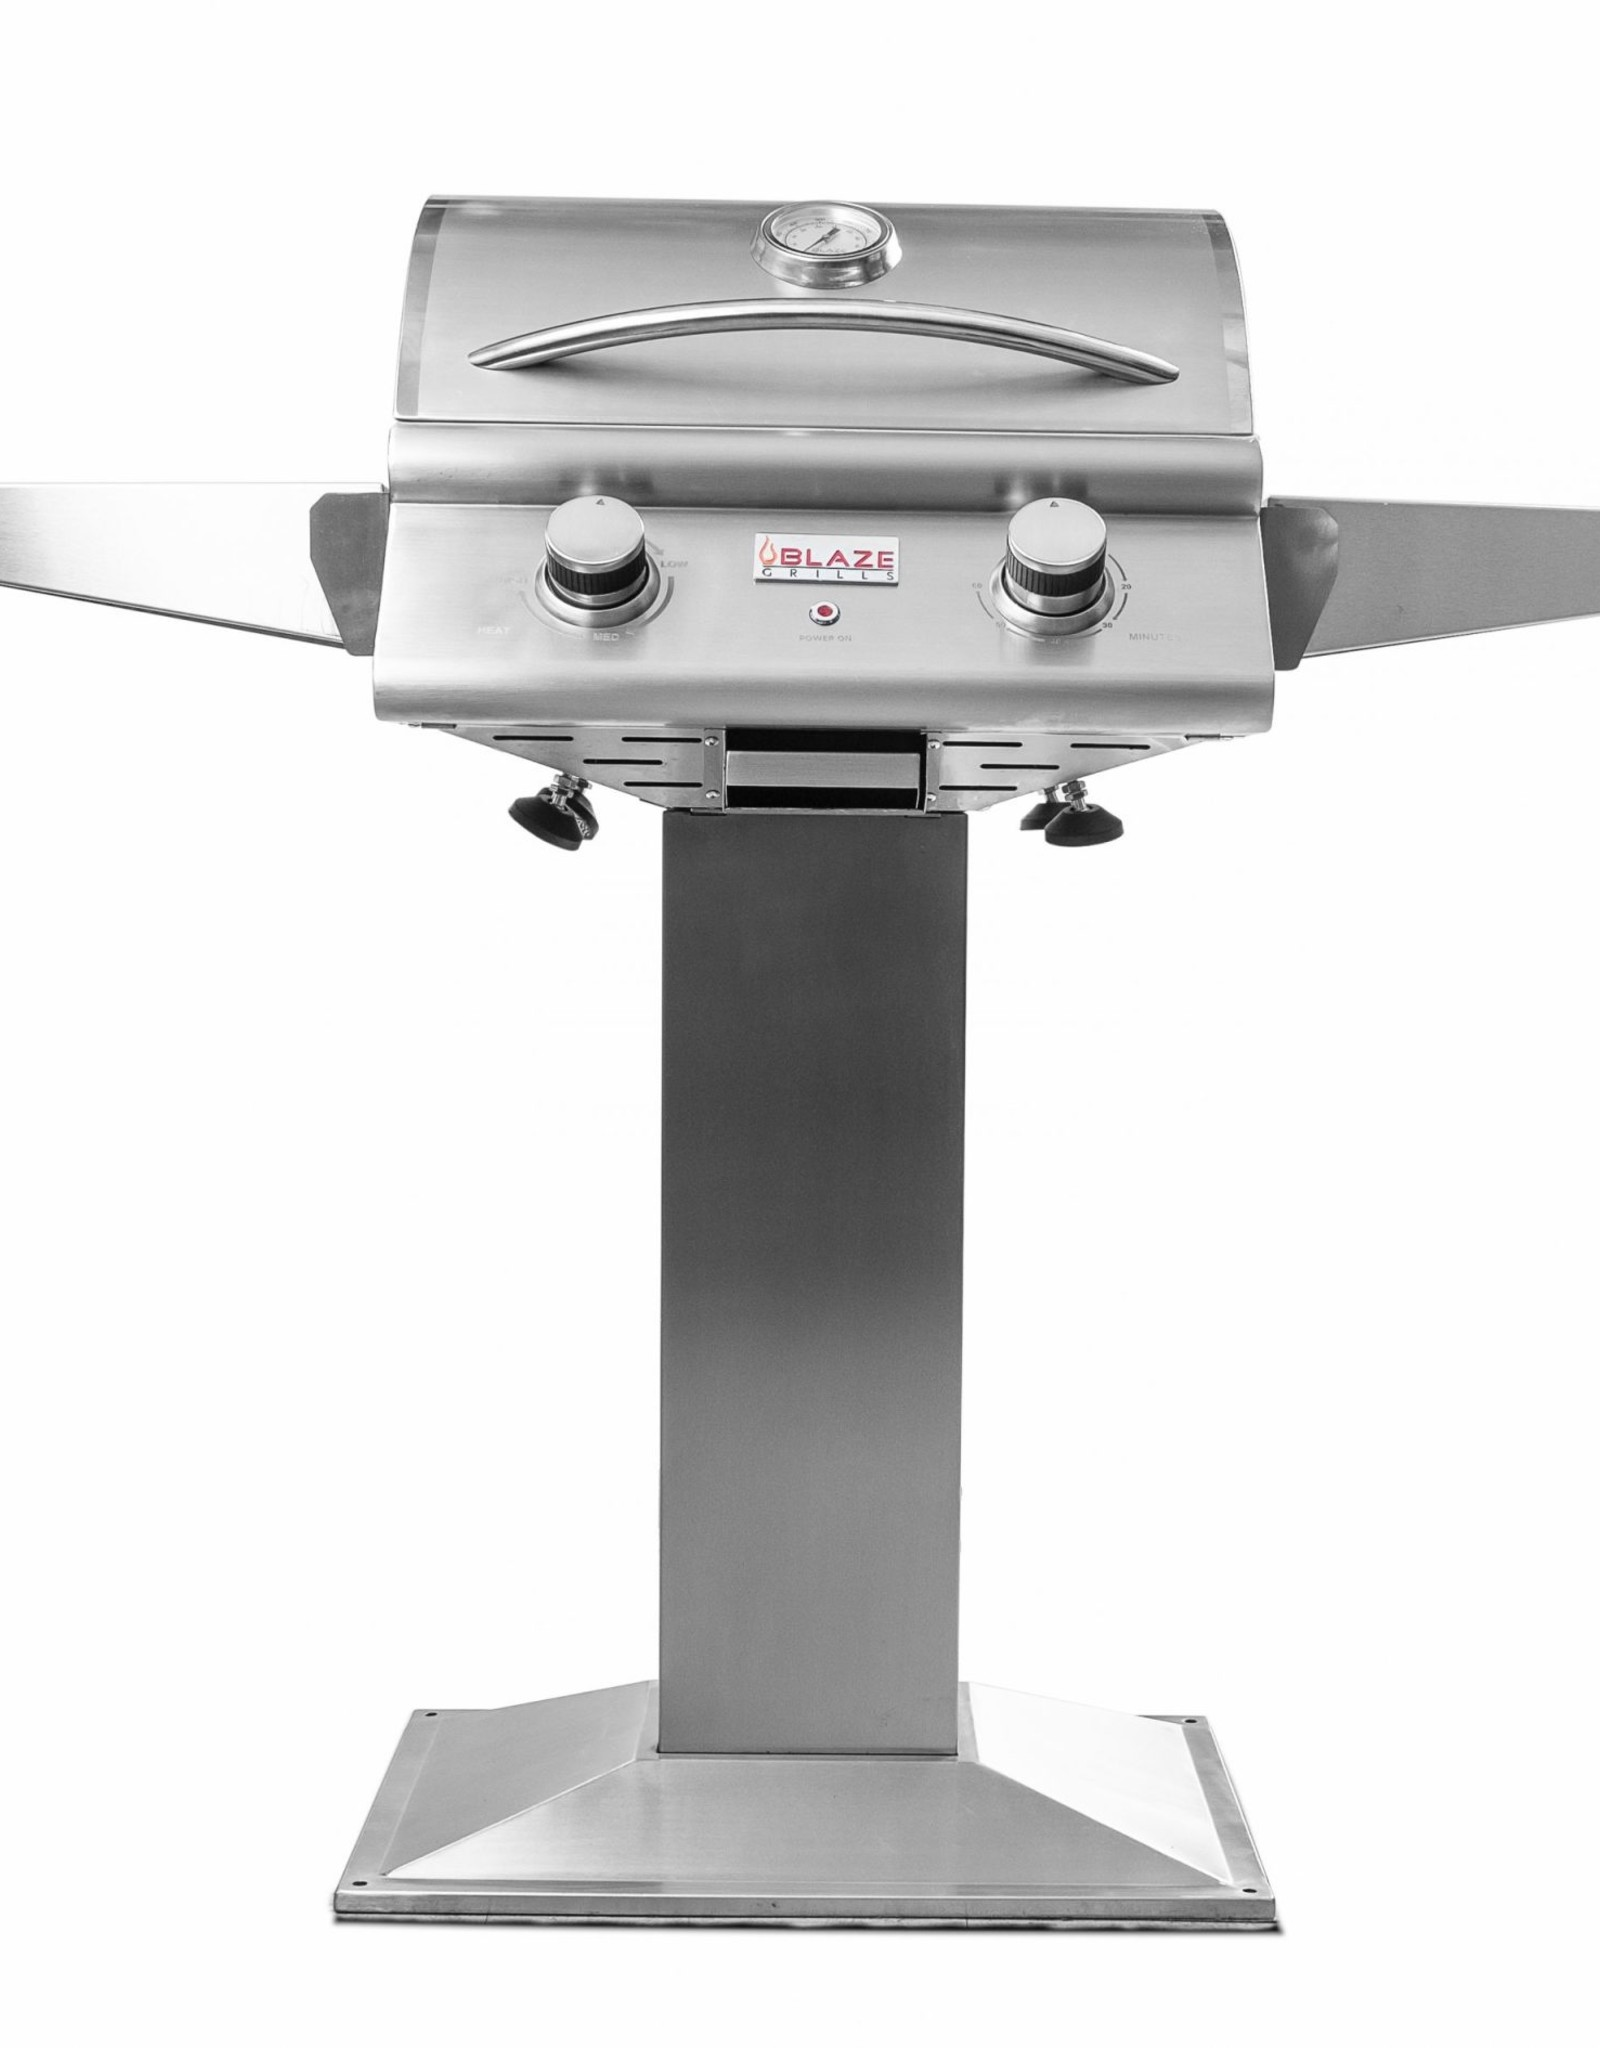 Blaze Outdoor Products Blaze Electric Grill Pedestal - BLZ-ELEC21-BASE